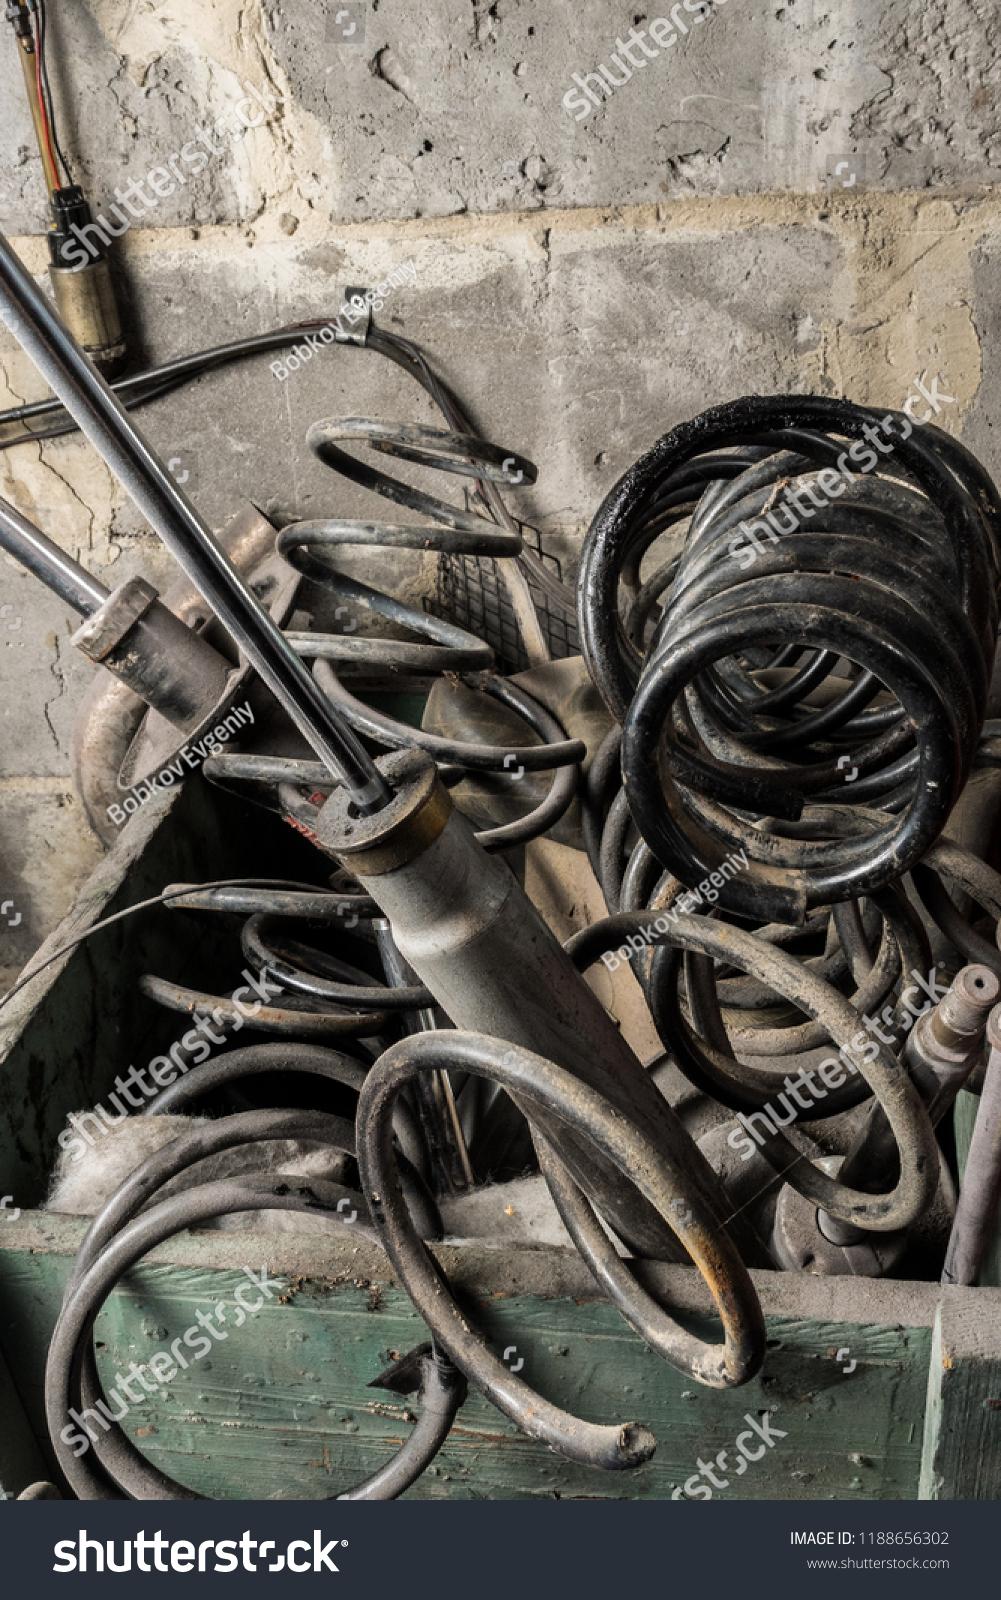 Metal Waste Scrap Old Car Parts Stock Photo Edit Now 1188656302